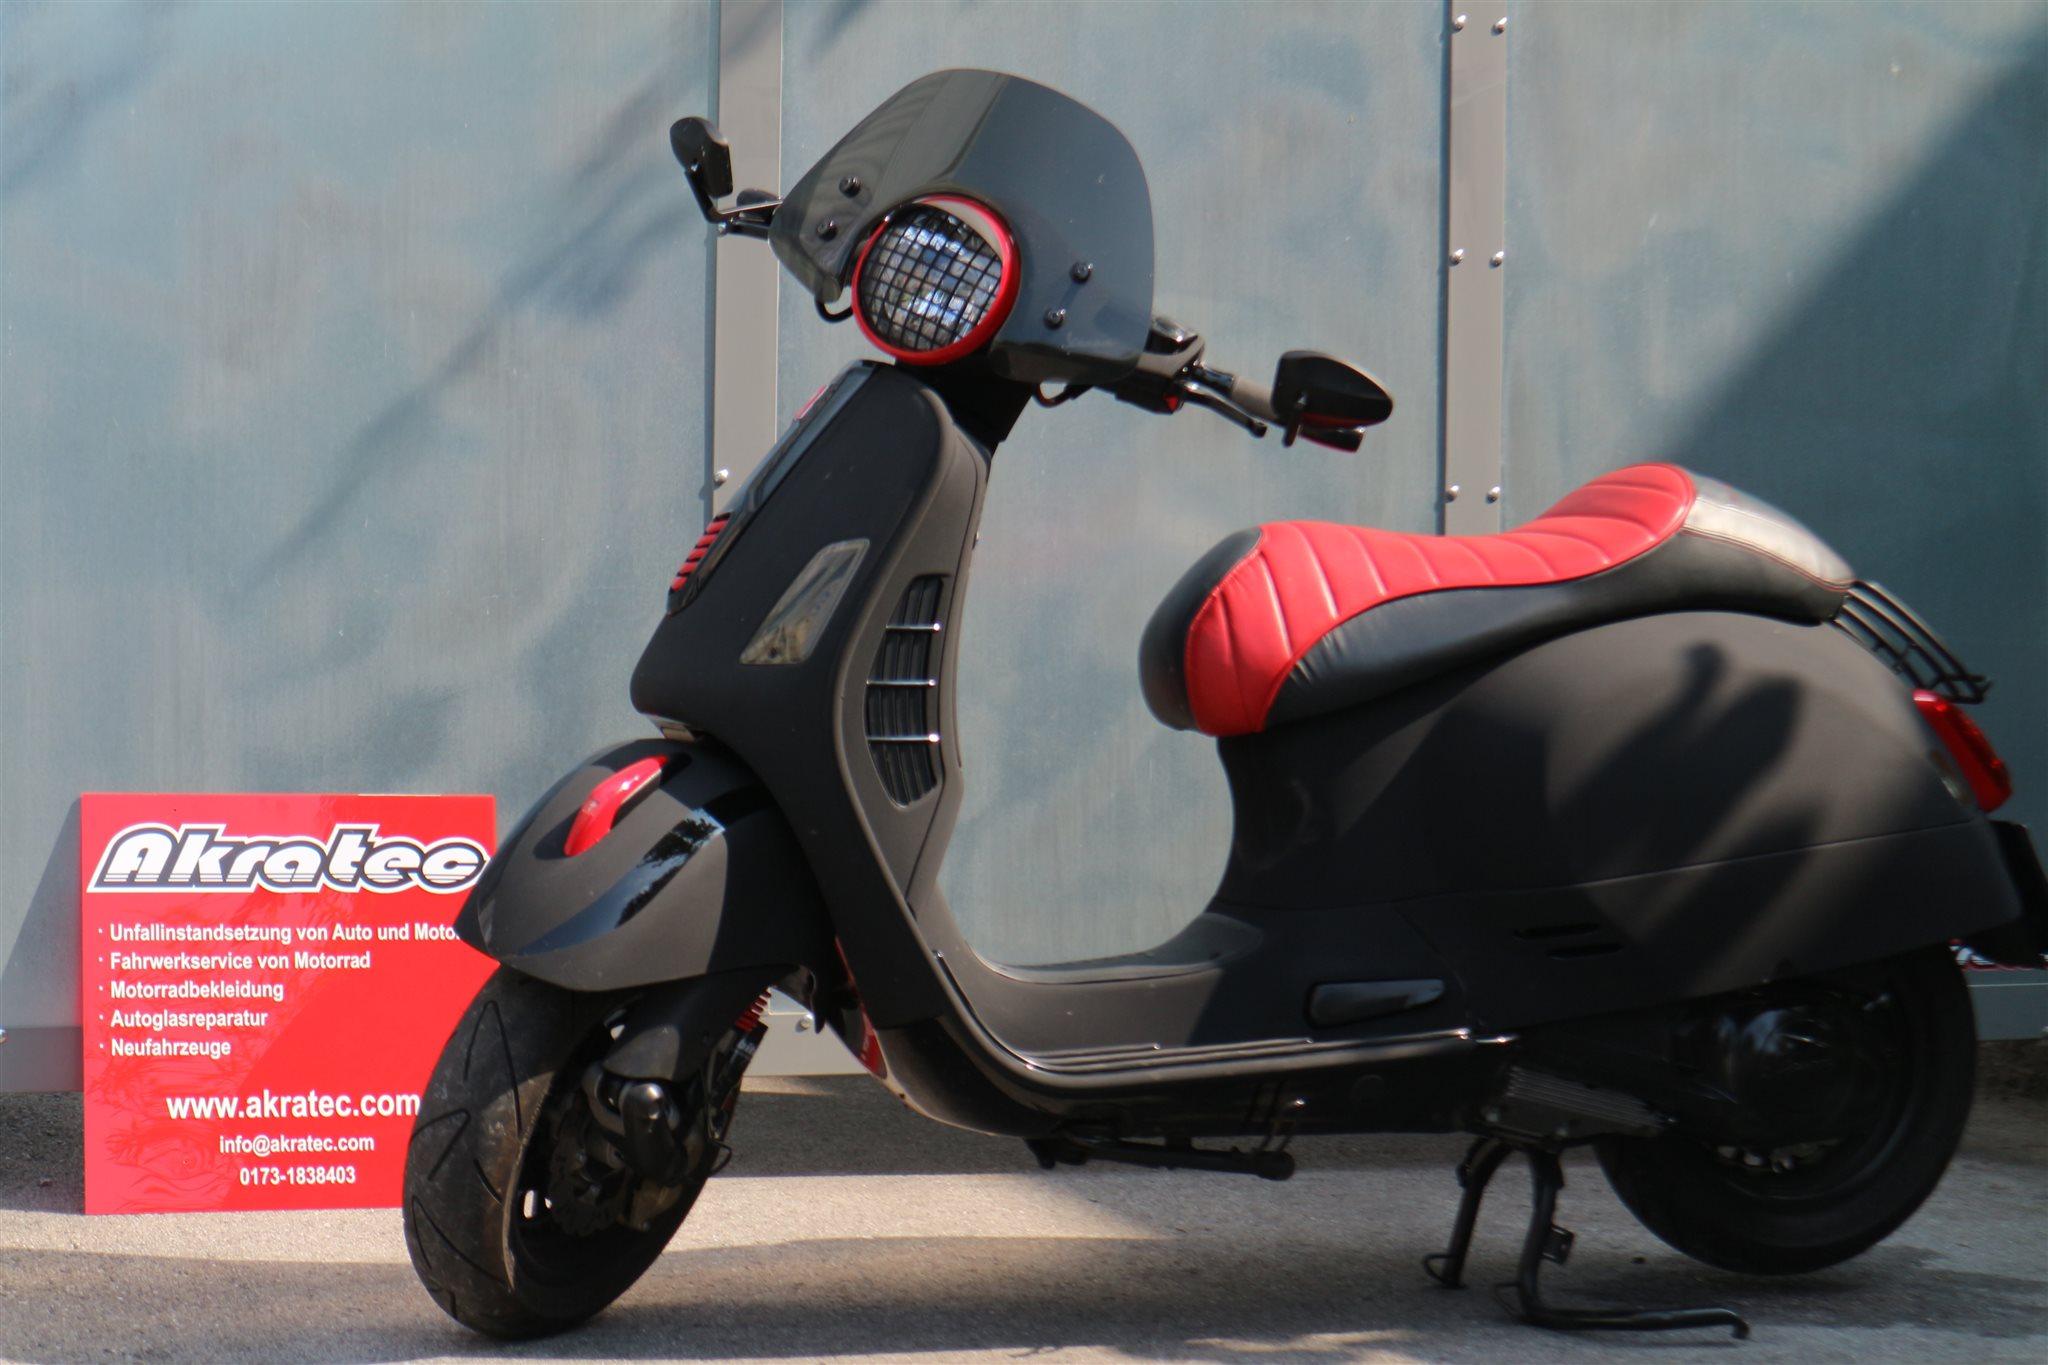 umgebautes motorrad vespa gts 125 i e super sport von. Black Bedroom Furniture Sets. Home Design Ideas